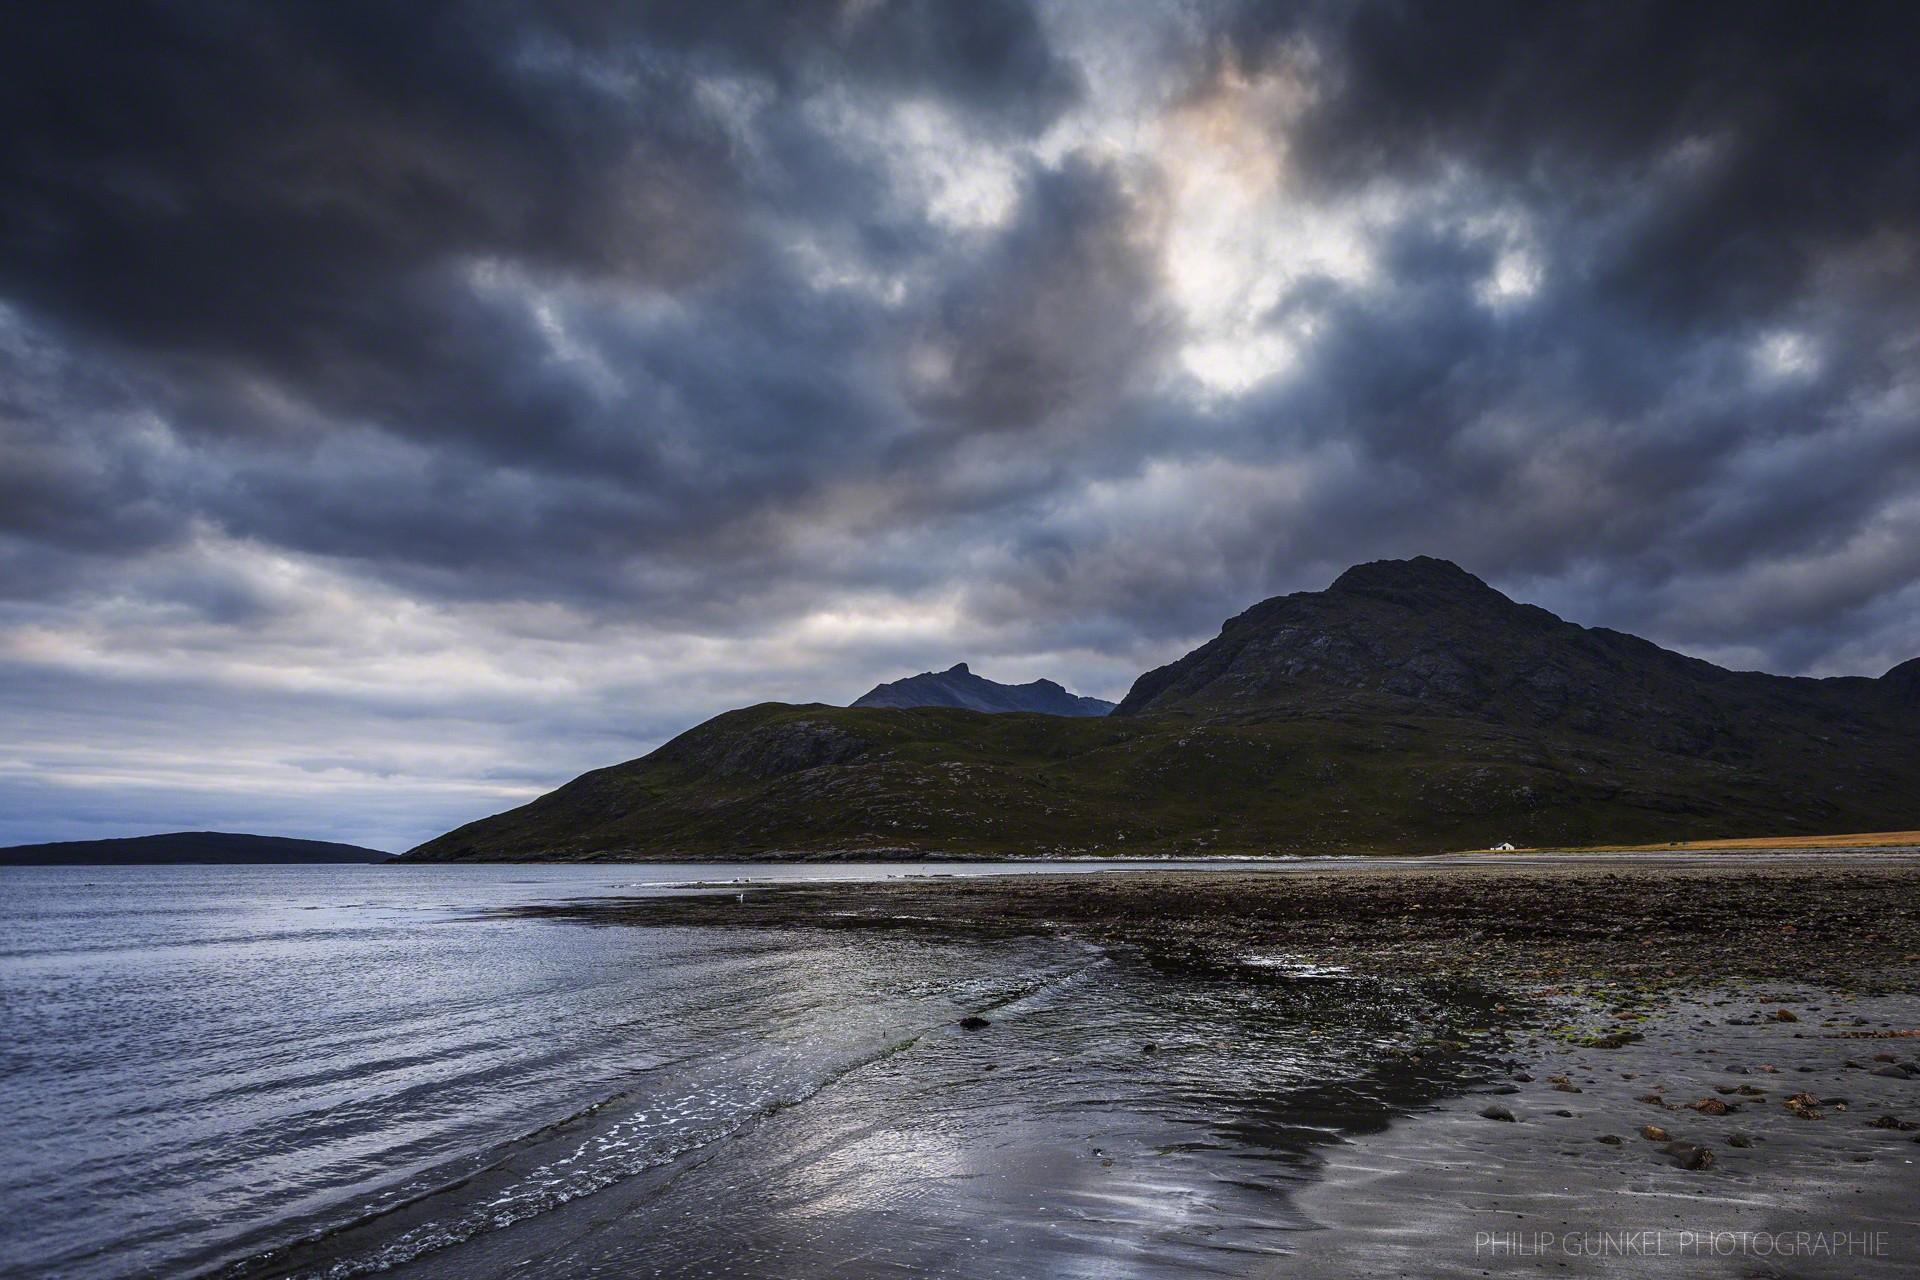 scotland_philip_gunkel_photographie_www.philipgunkel.de26